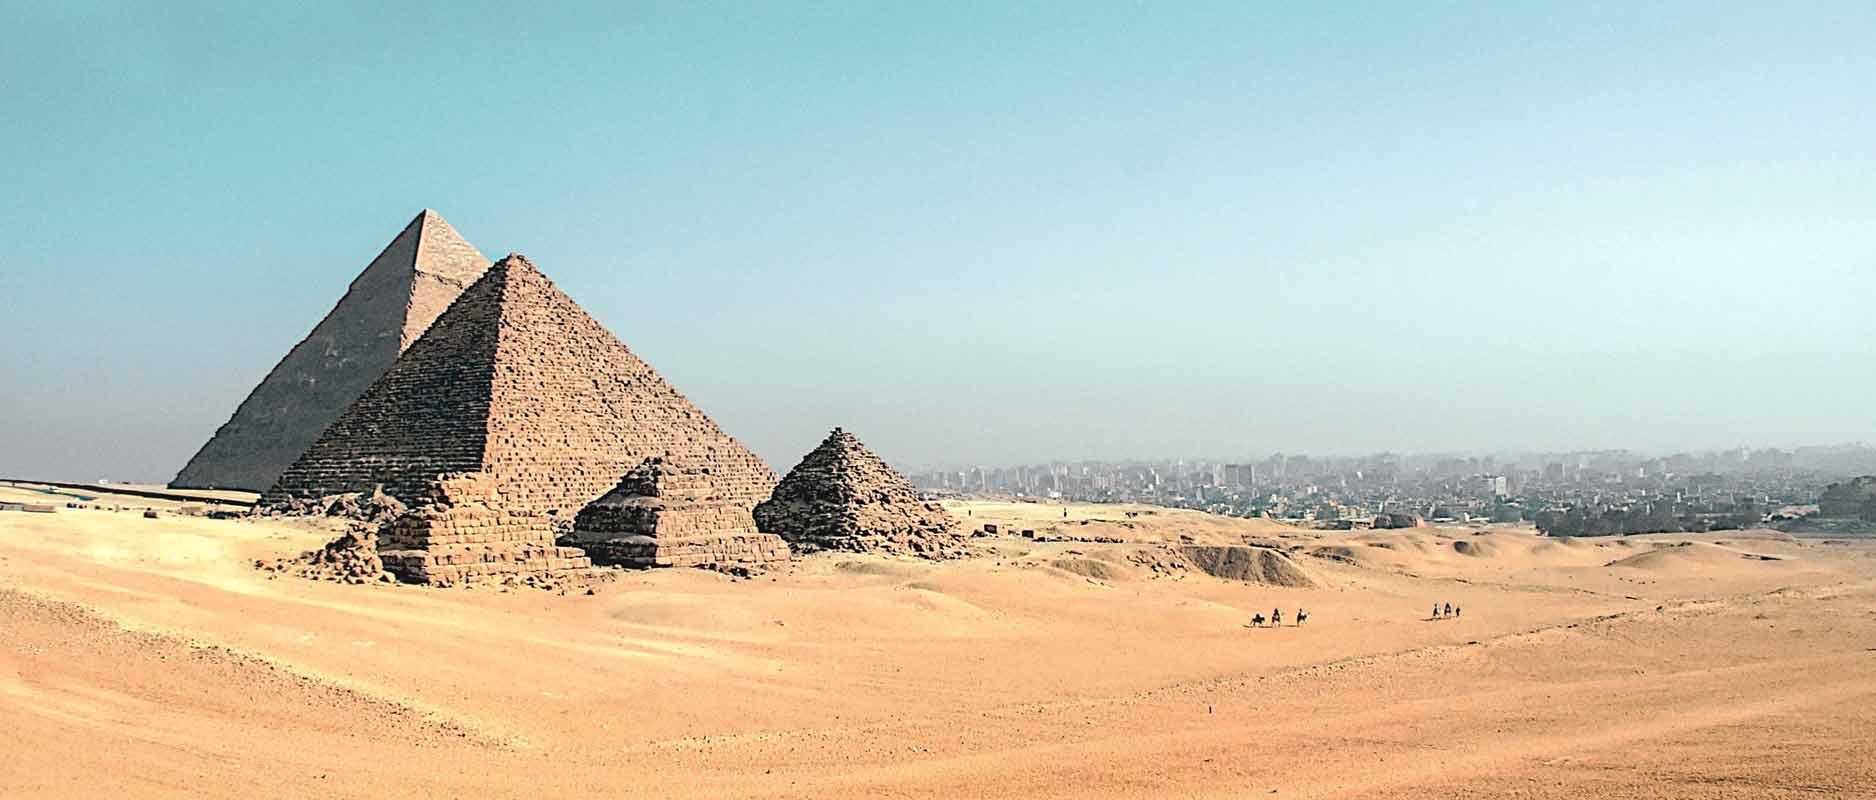 Mozes, de prins van Egypte